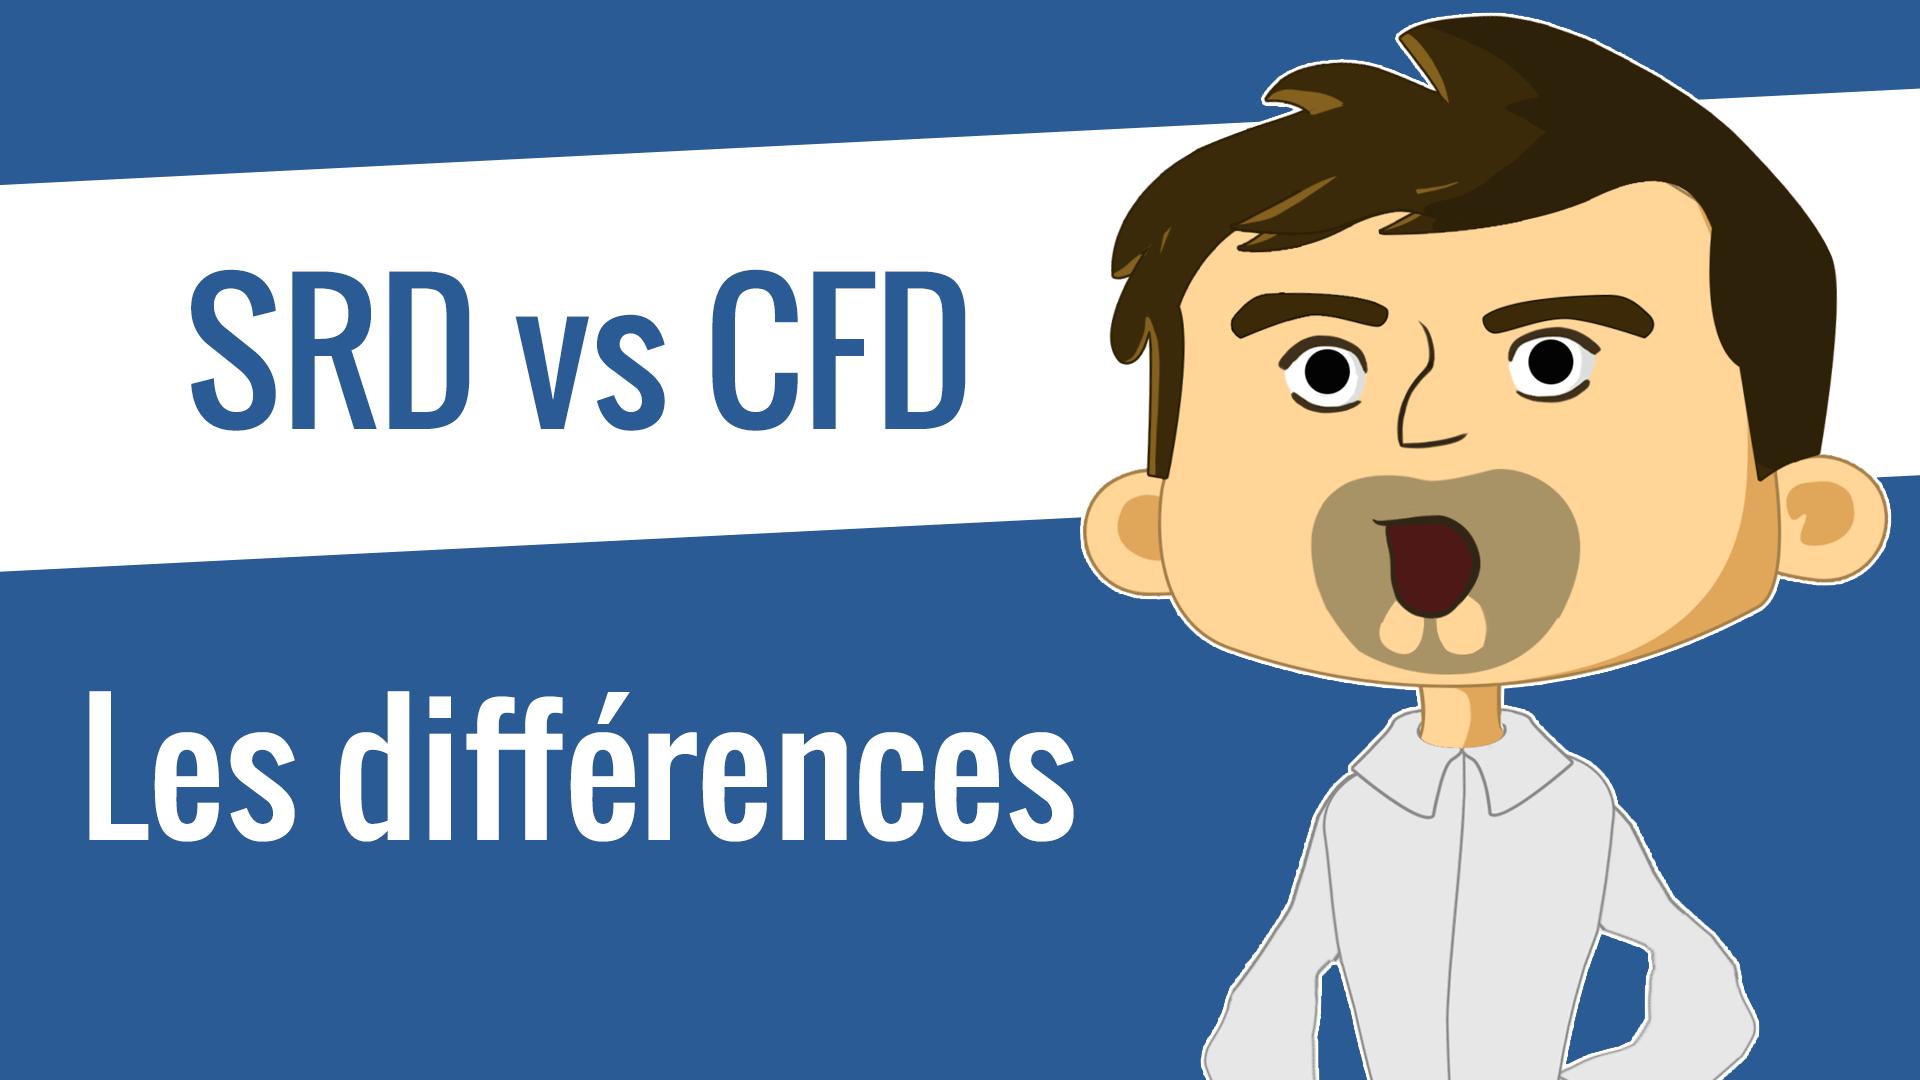 SRD vs CFD les différences